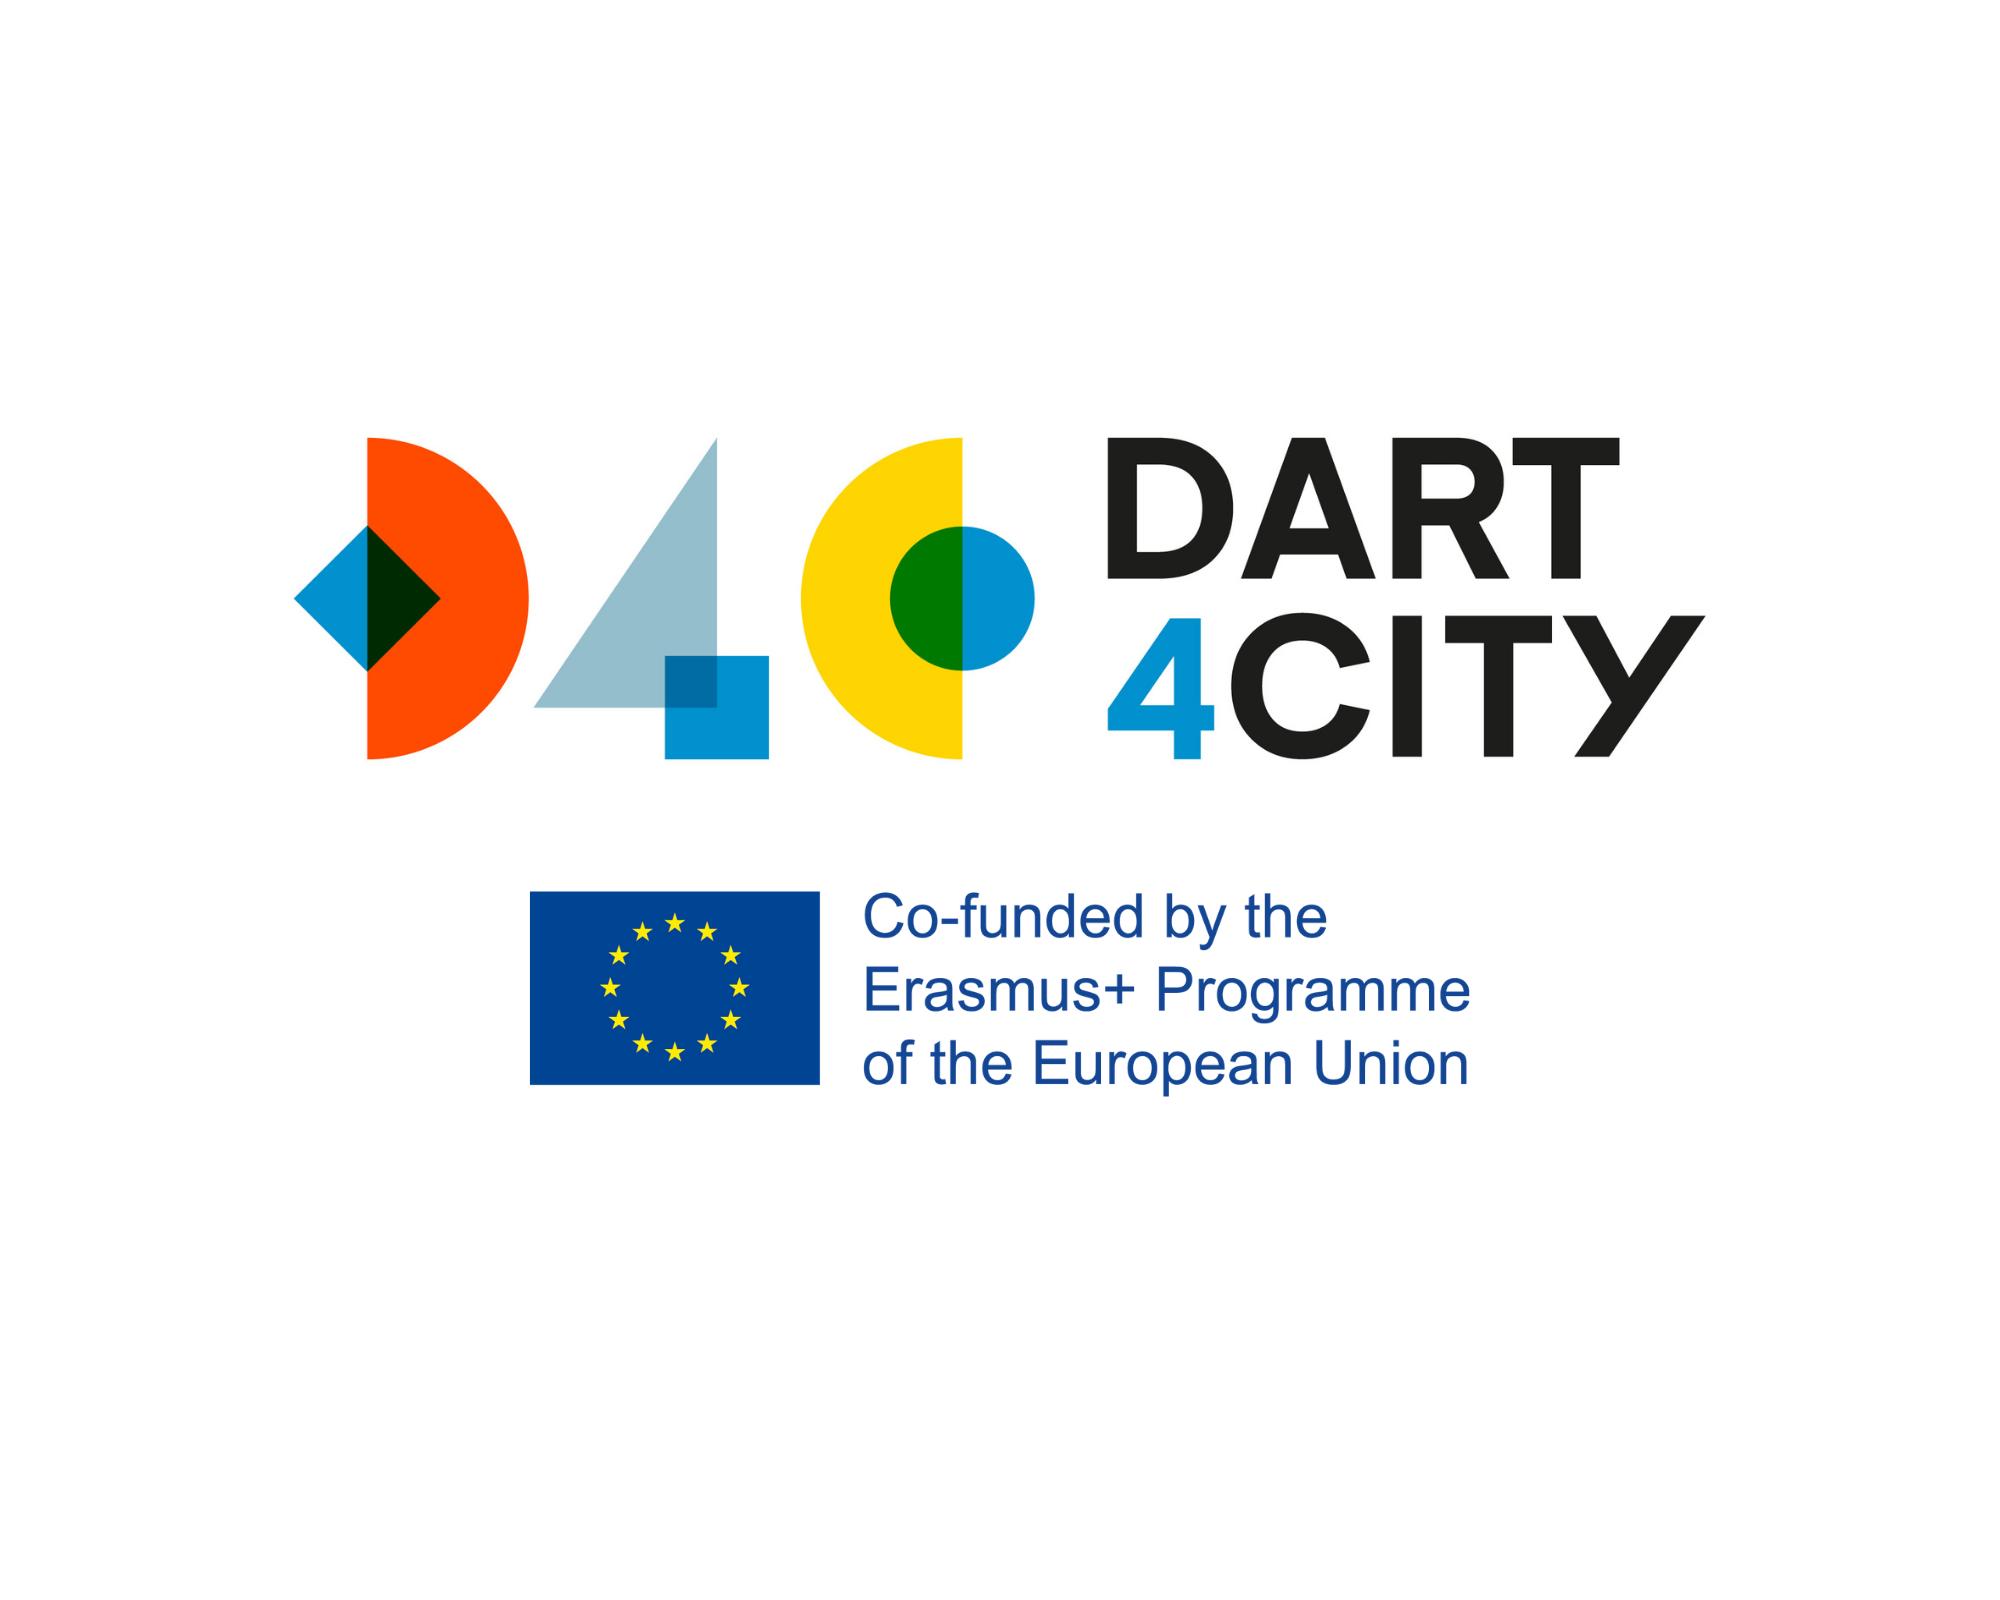 DART4City